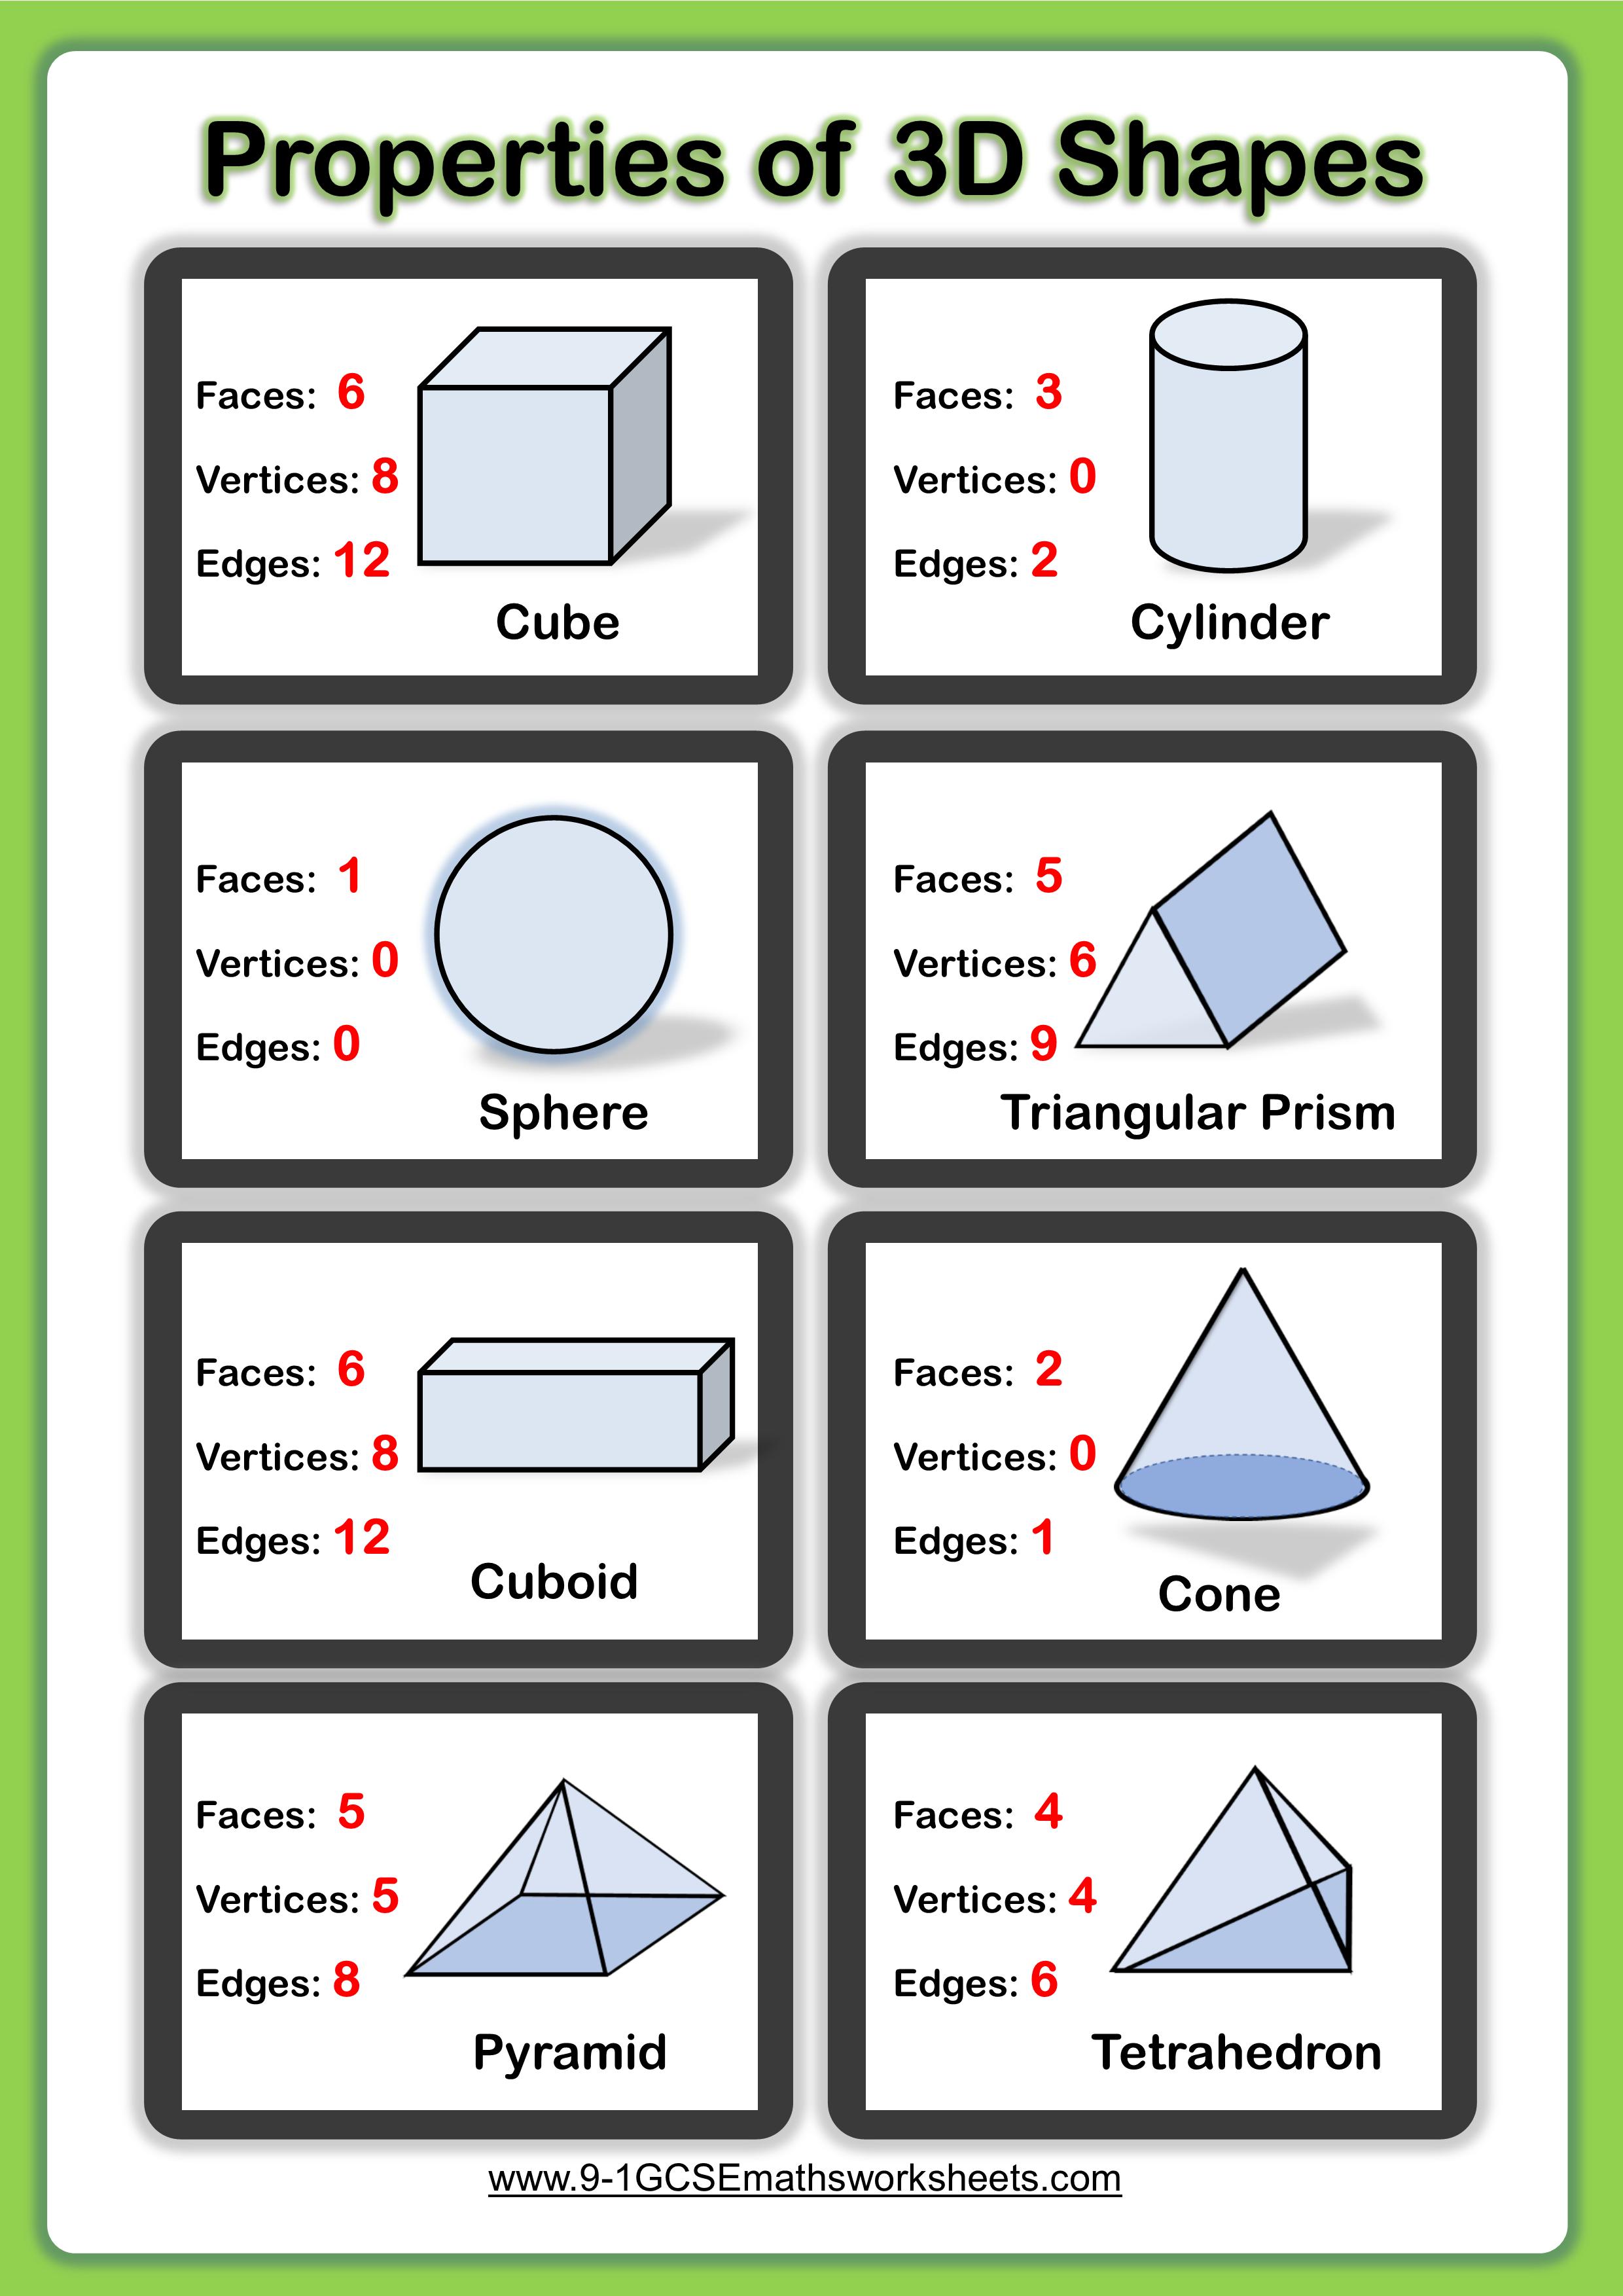 properties of 3d shapes worksheet